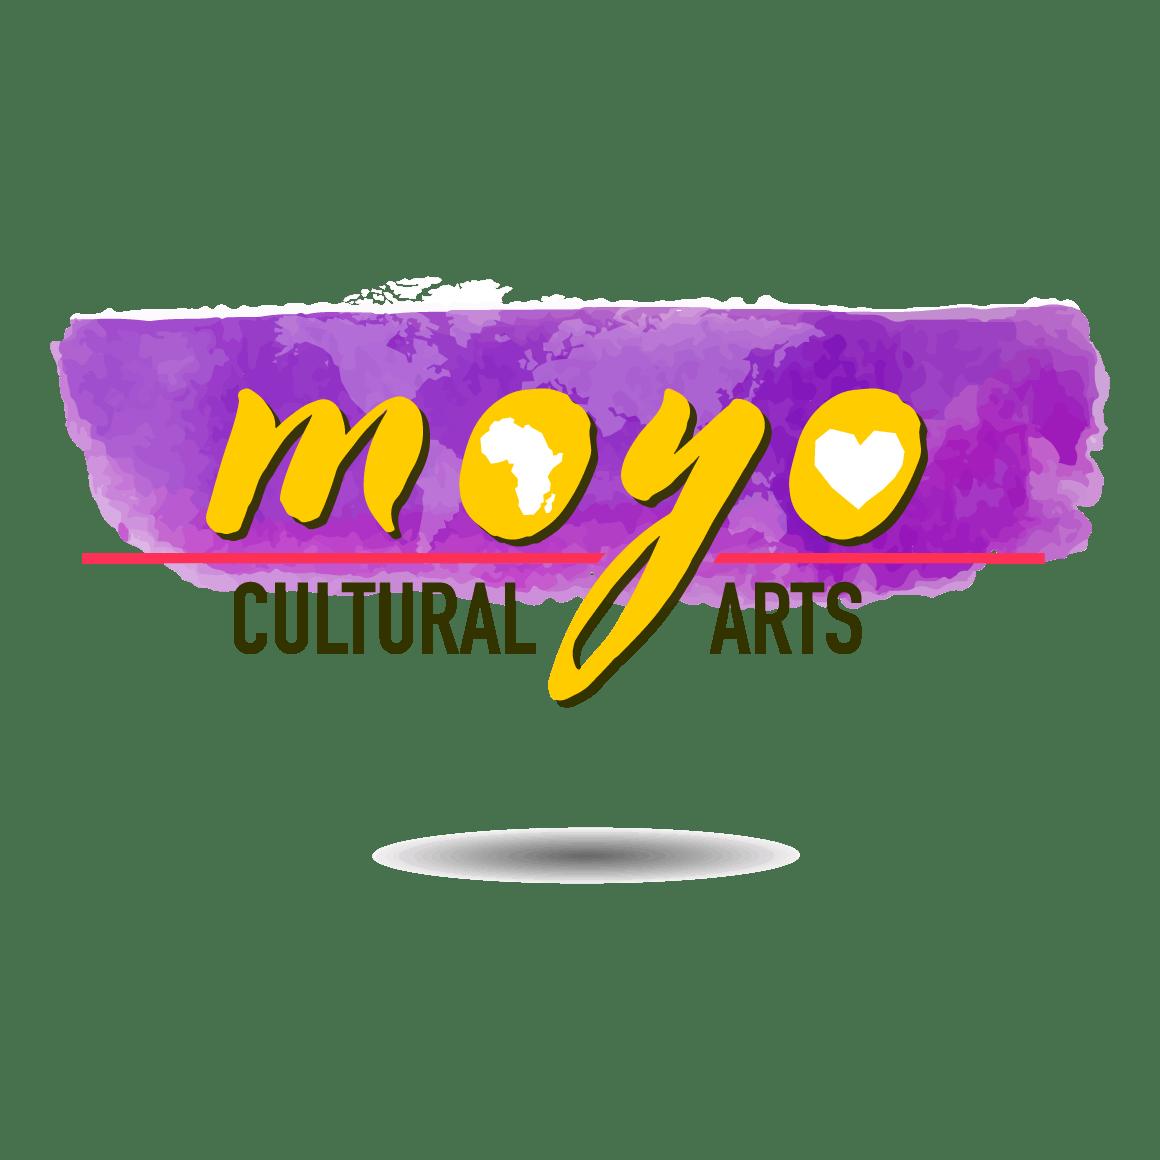 Mythbusters Series Mendiani vs. Soli